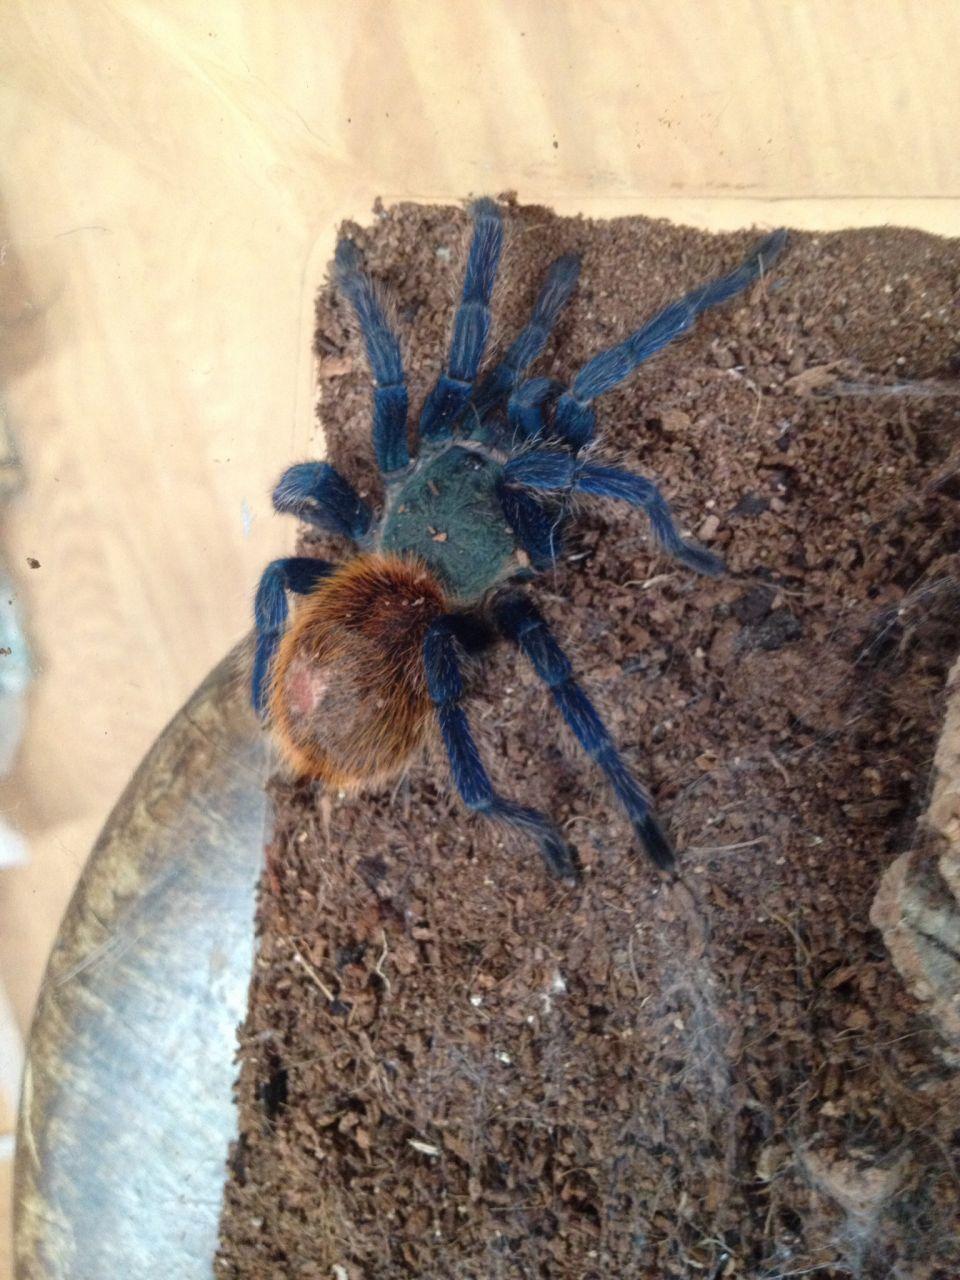 Green bottle blue tarantula Tarantulas for sale, Green, Blue